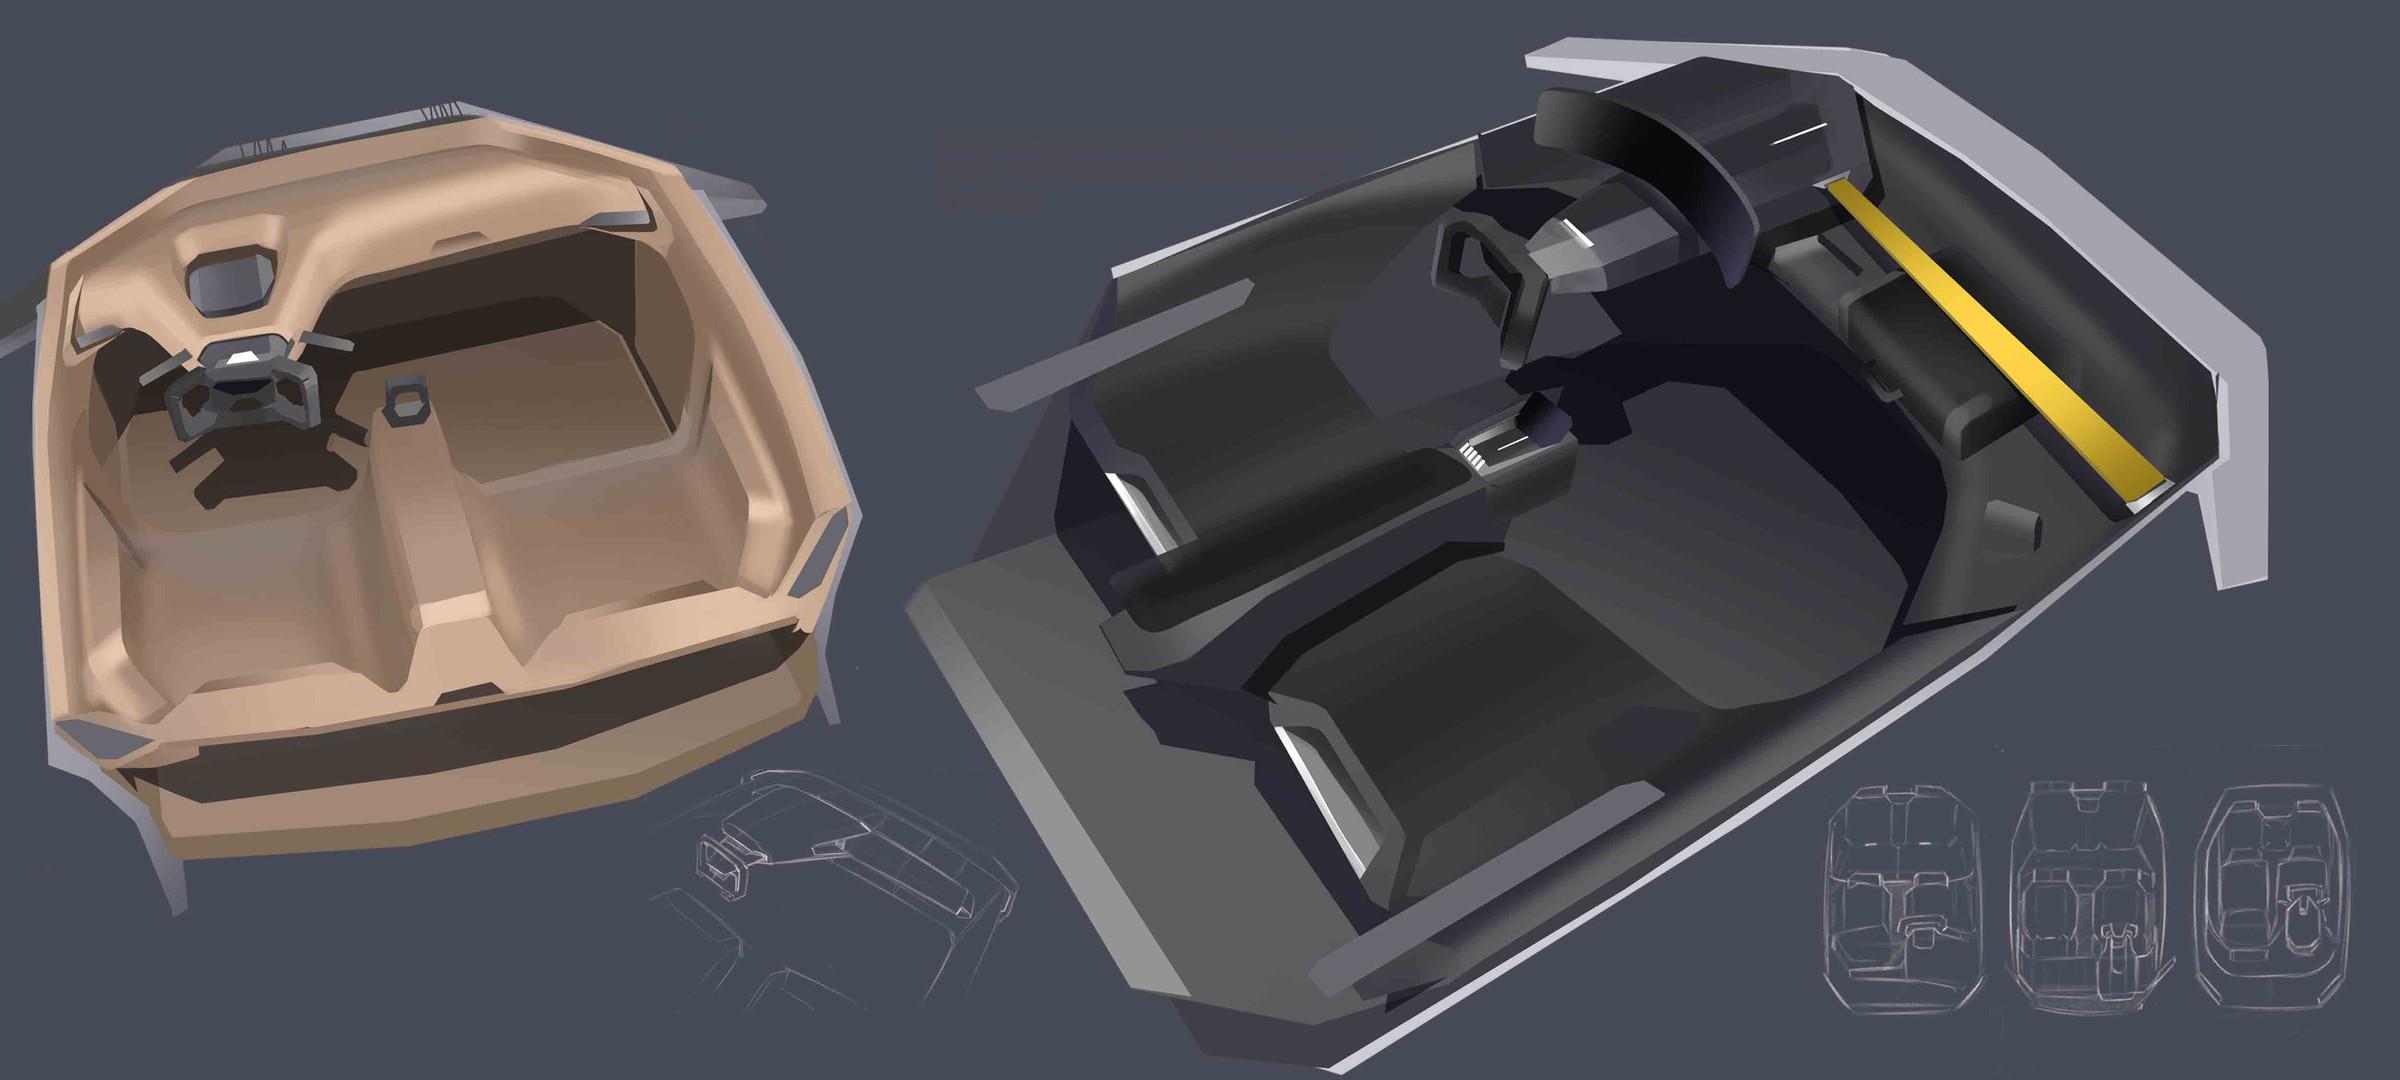 Gargoyle Interior SlidesArtboard 15.jpg